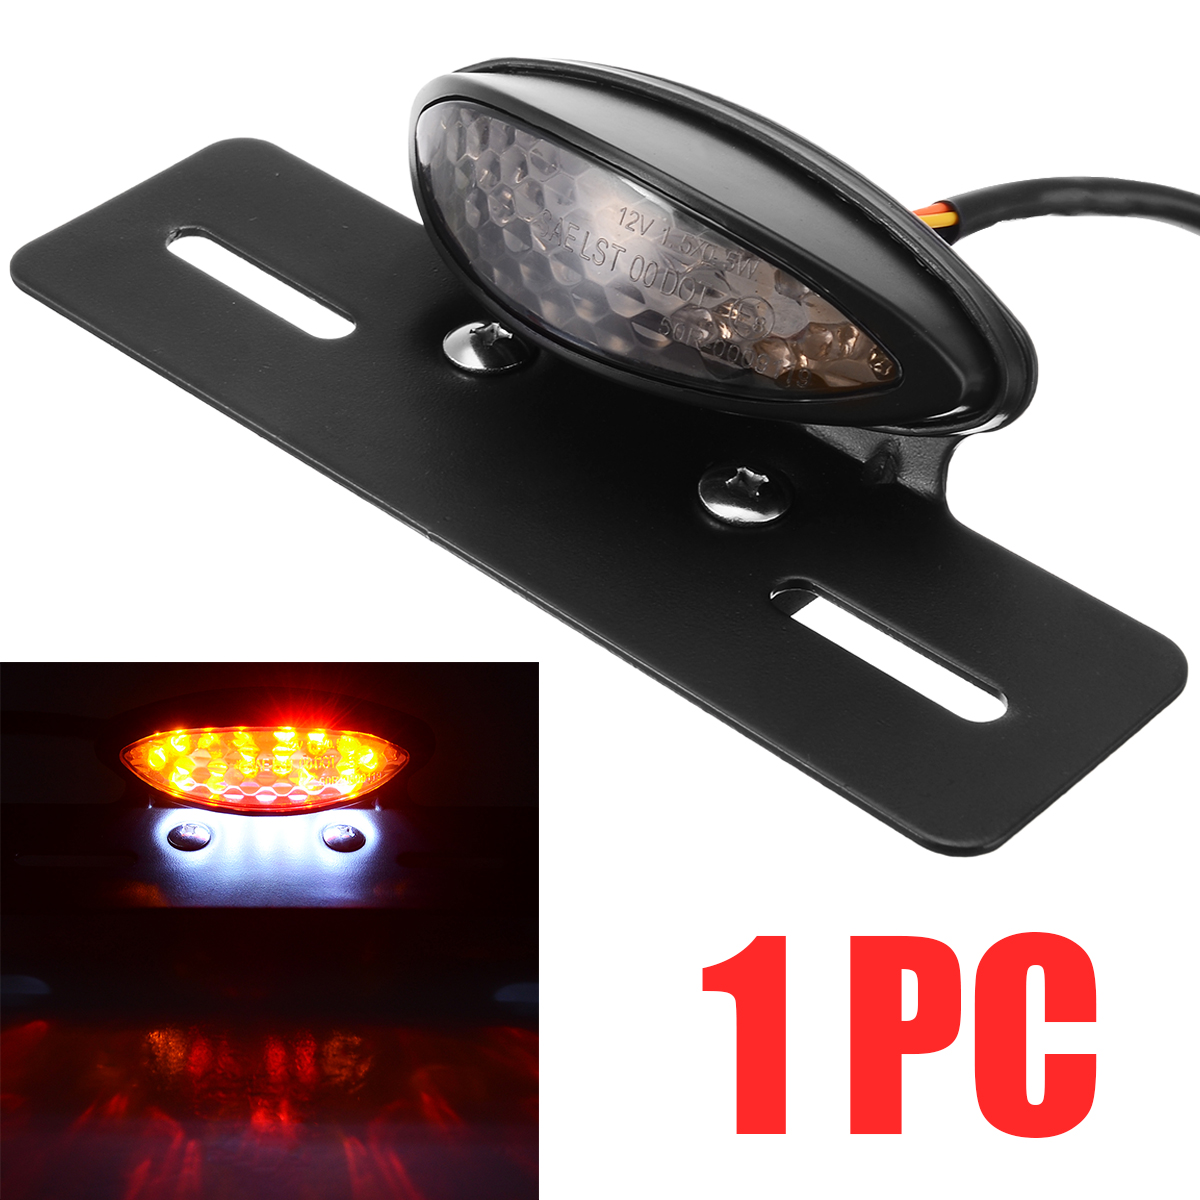 12V LED Motorcycle Bobber Red Yellow Rear Tail Light Brake Turn Signal License Number Plate Integrated Lamp For Dirt Bike ATV